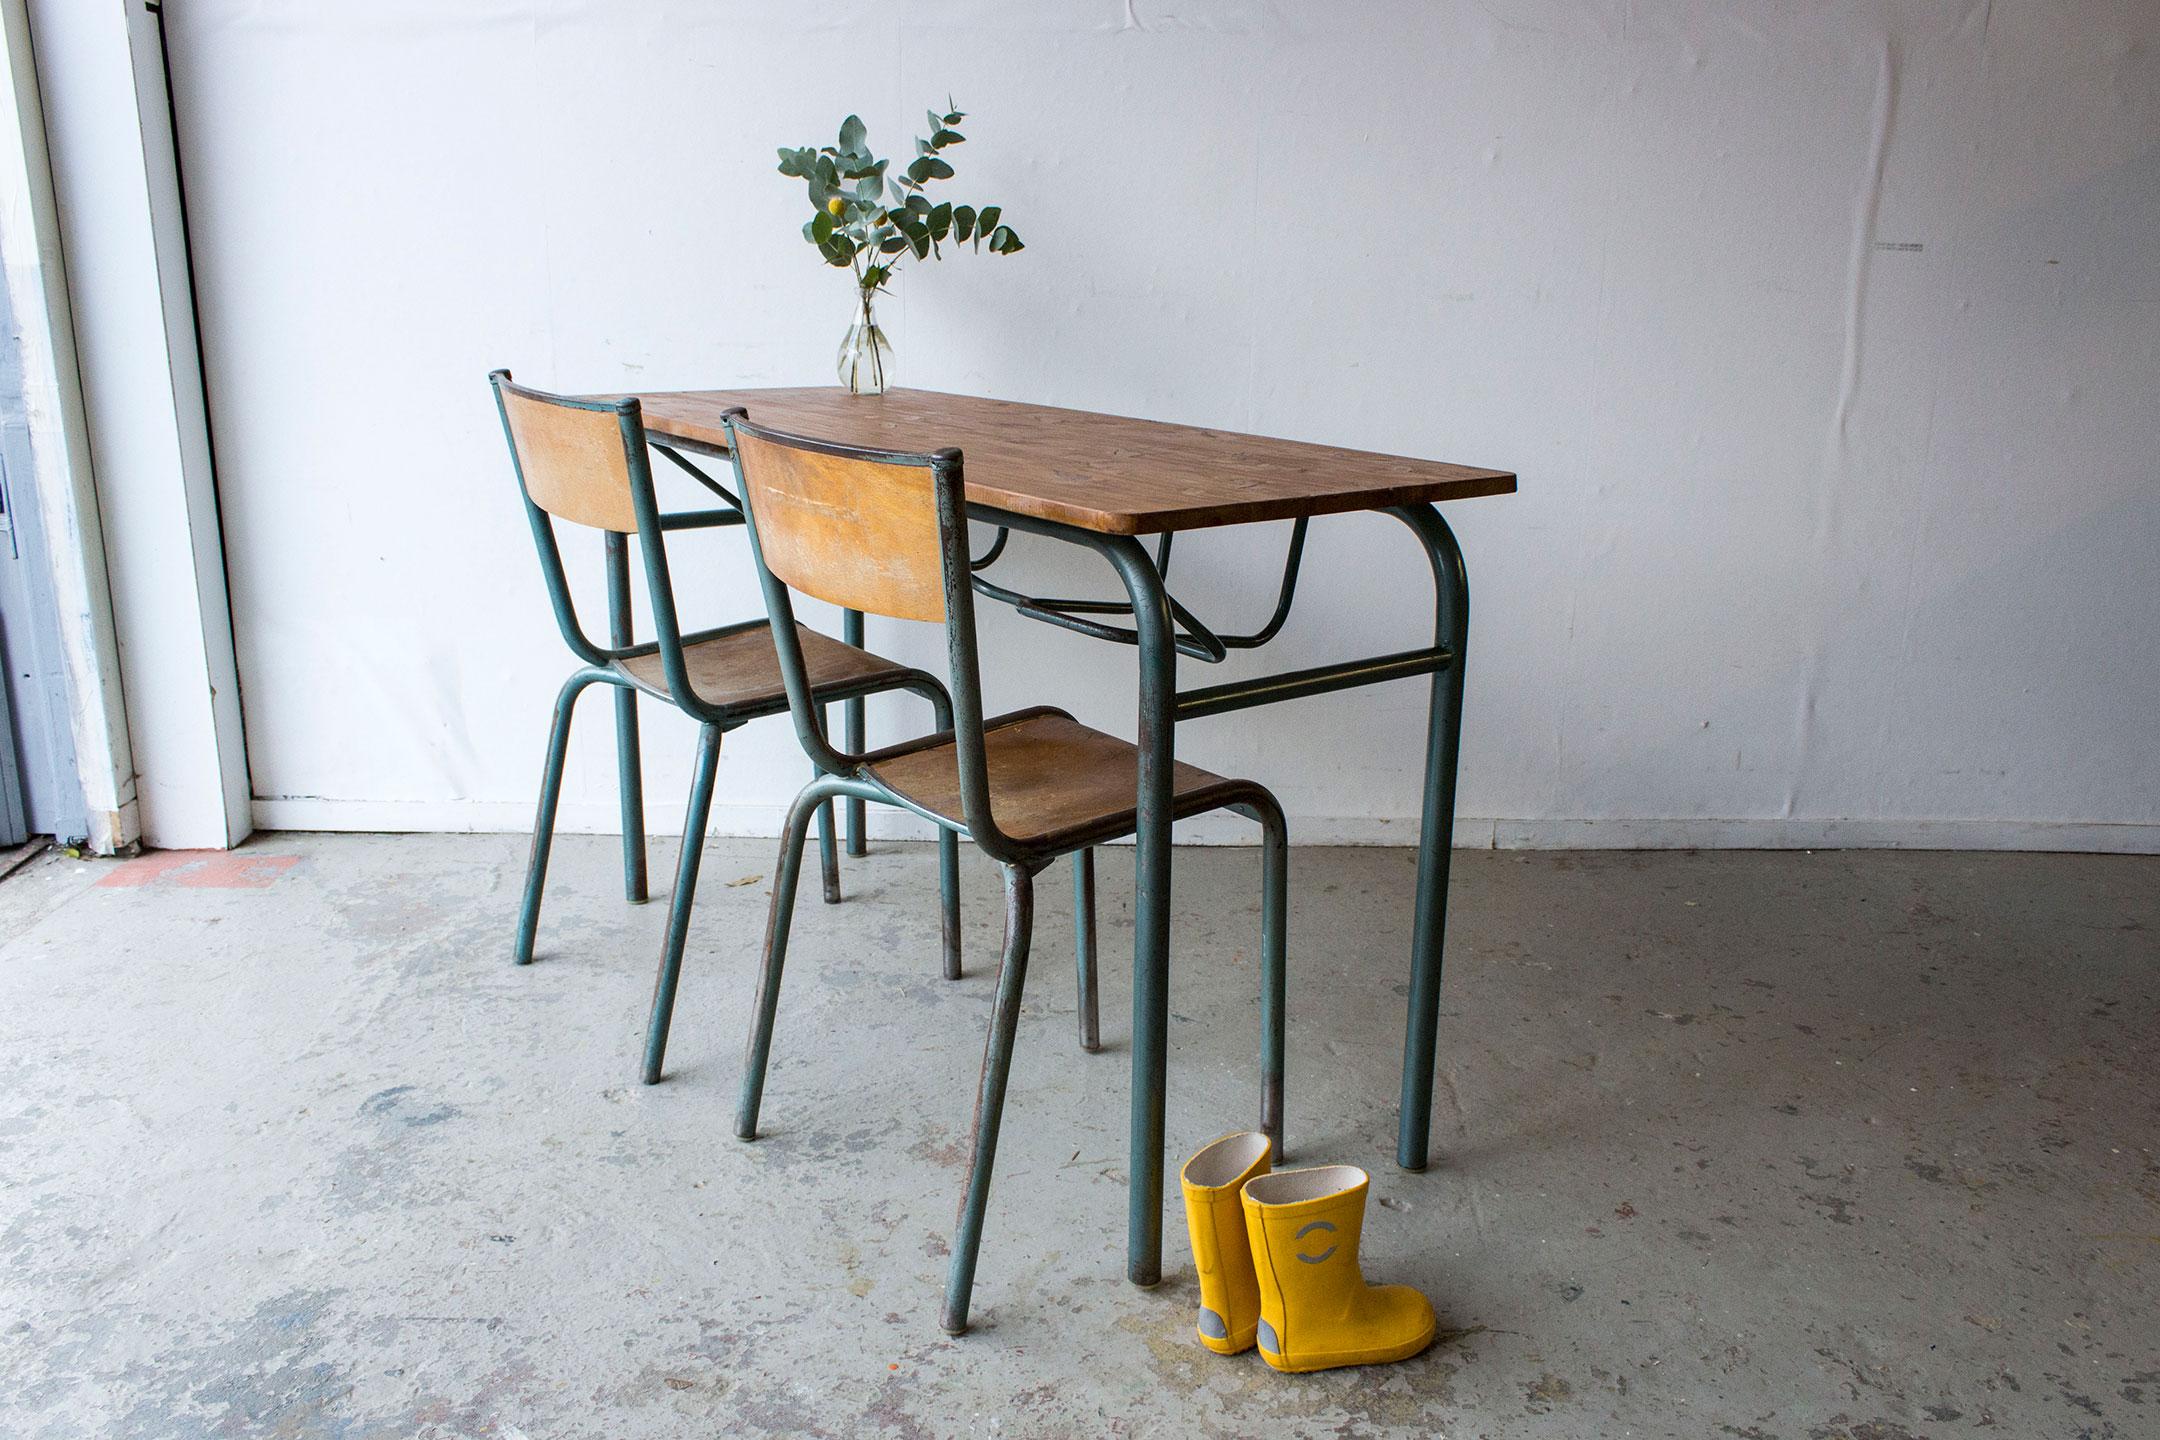 3170---vintage-schooltafel-grijsgroen-frame---Firma-zoethout_1.jpg